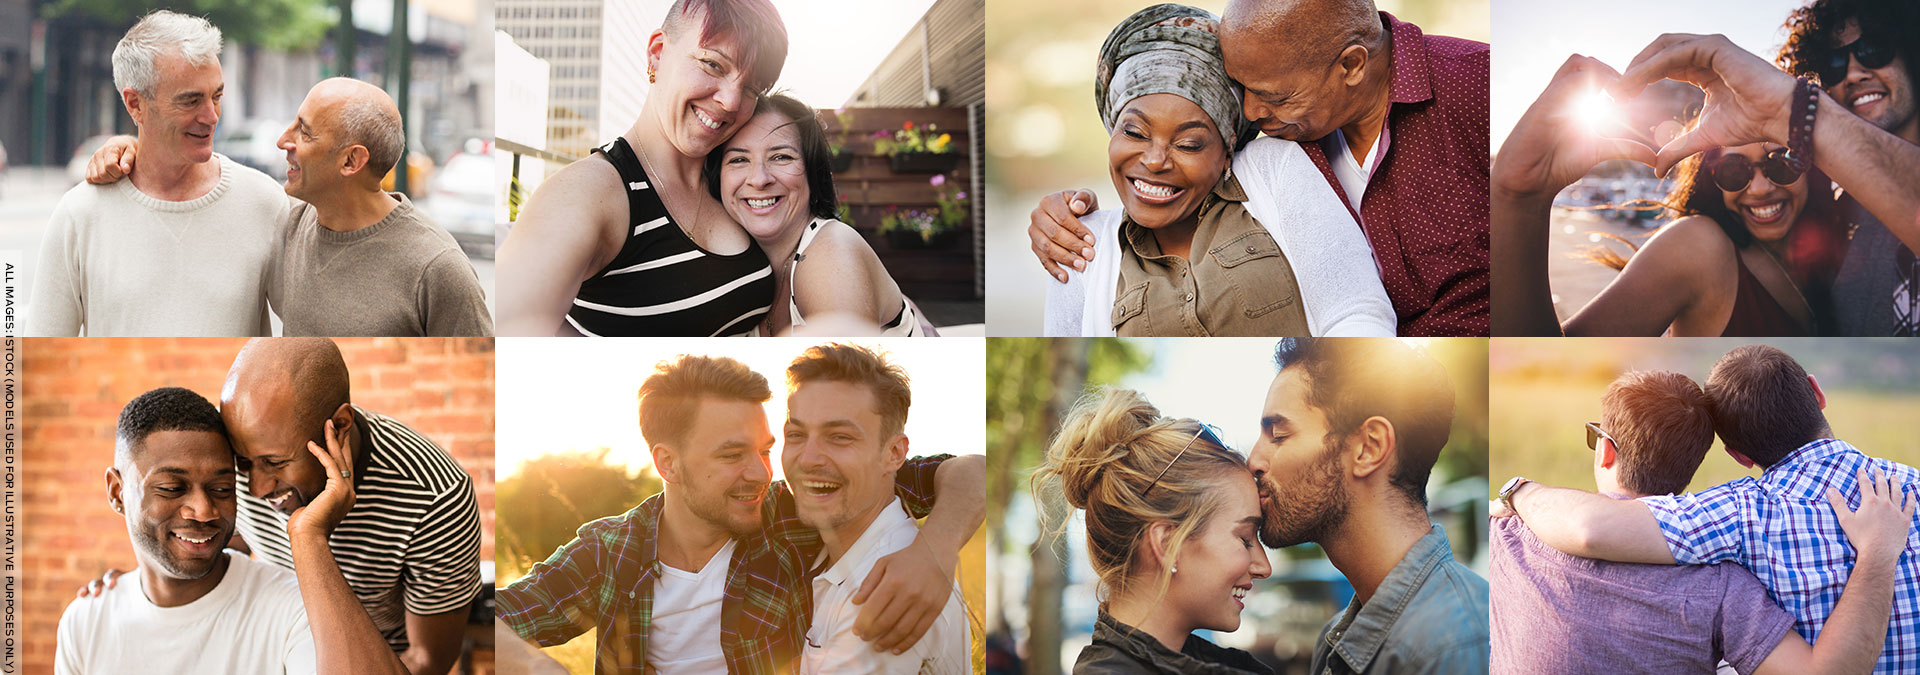 Online dating penang malaysia